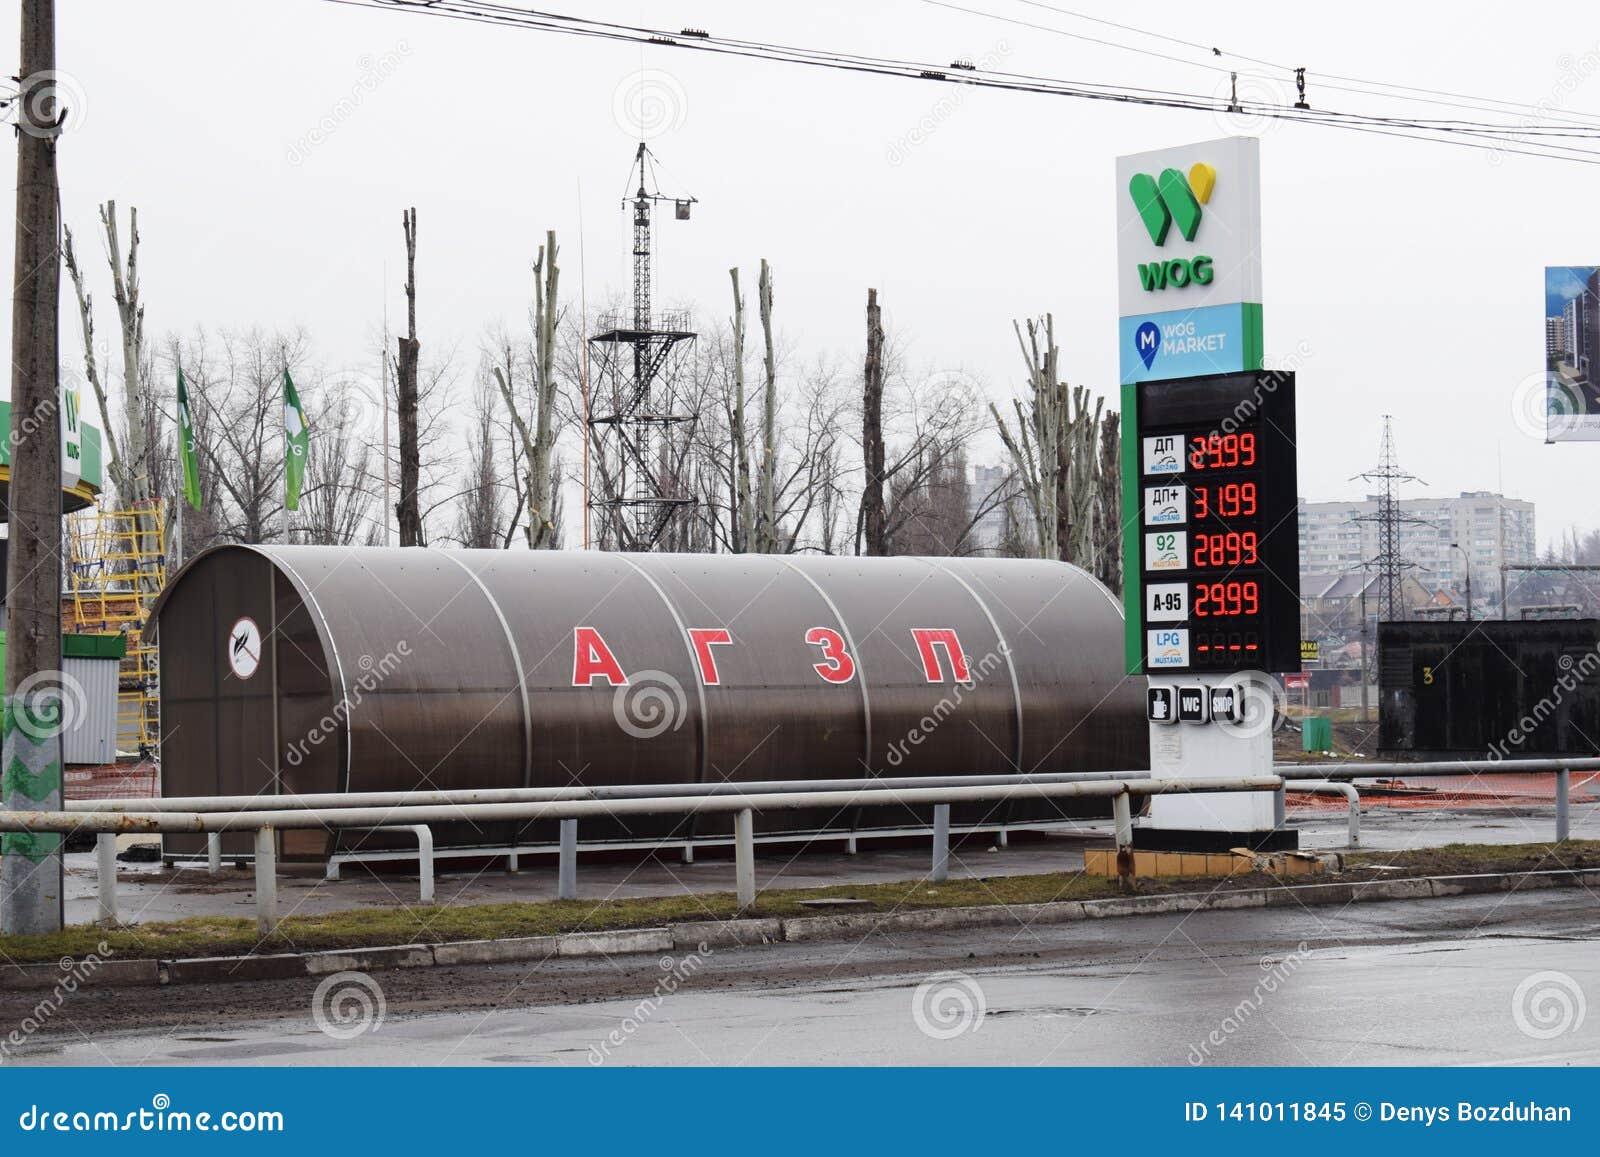 Ukraine, Kremenchug - March, 2019: Automotive fuel station WOG